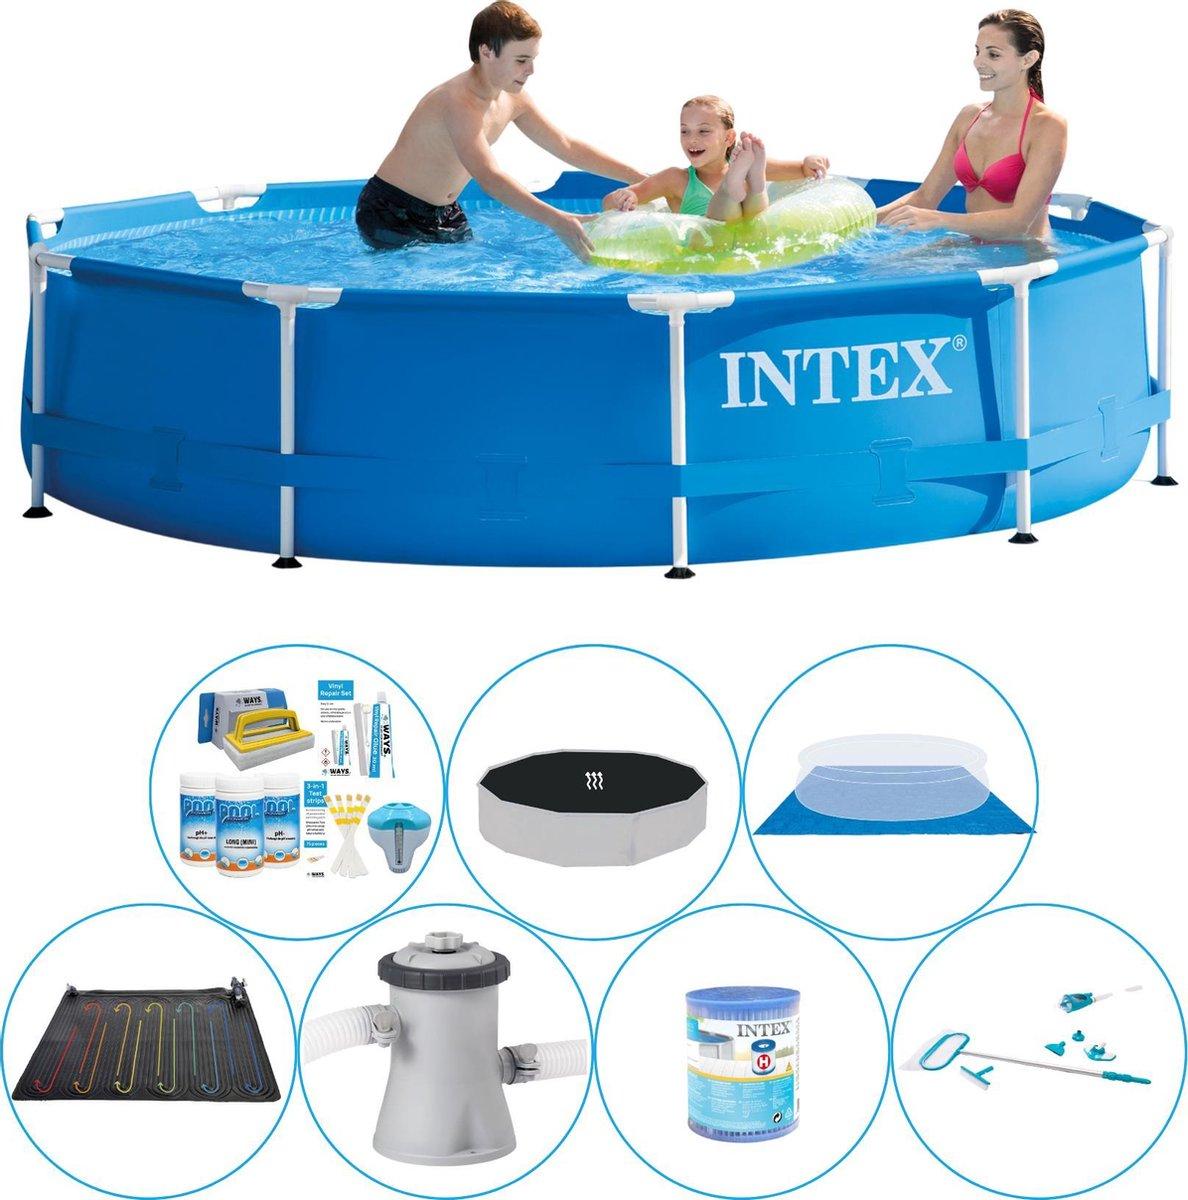 Intex Metal Frame Rond 305x76 cm - Alles in 1 Zwembad Set